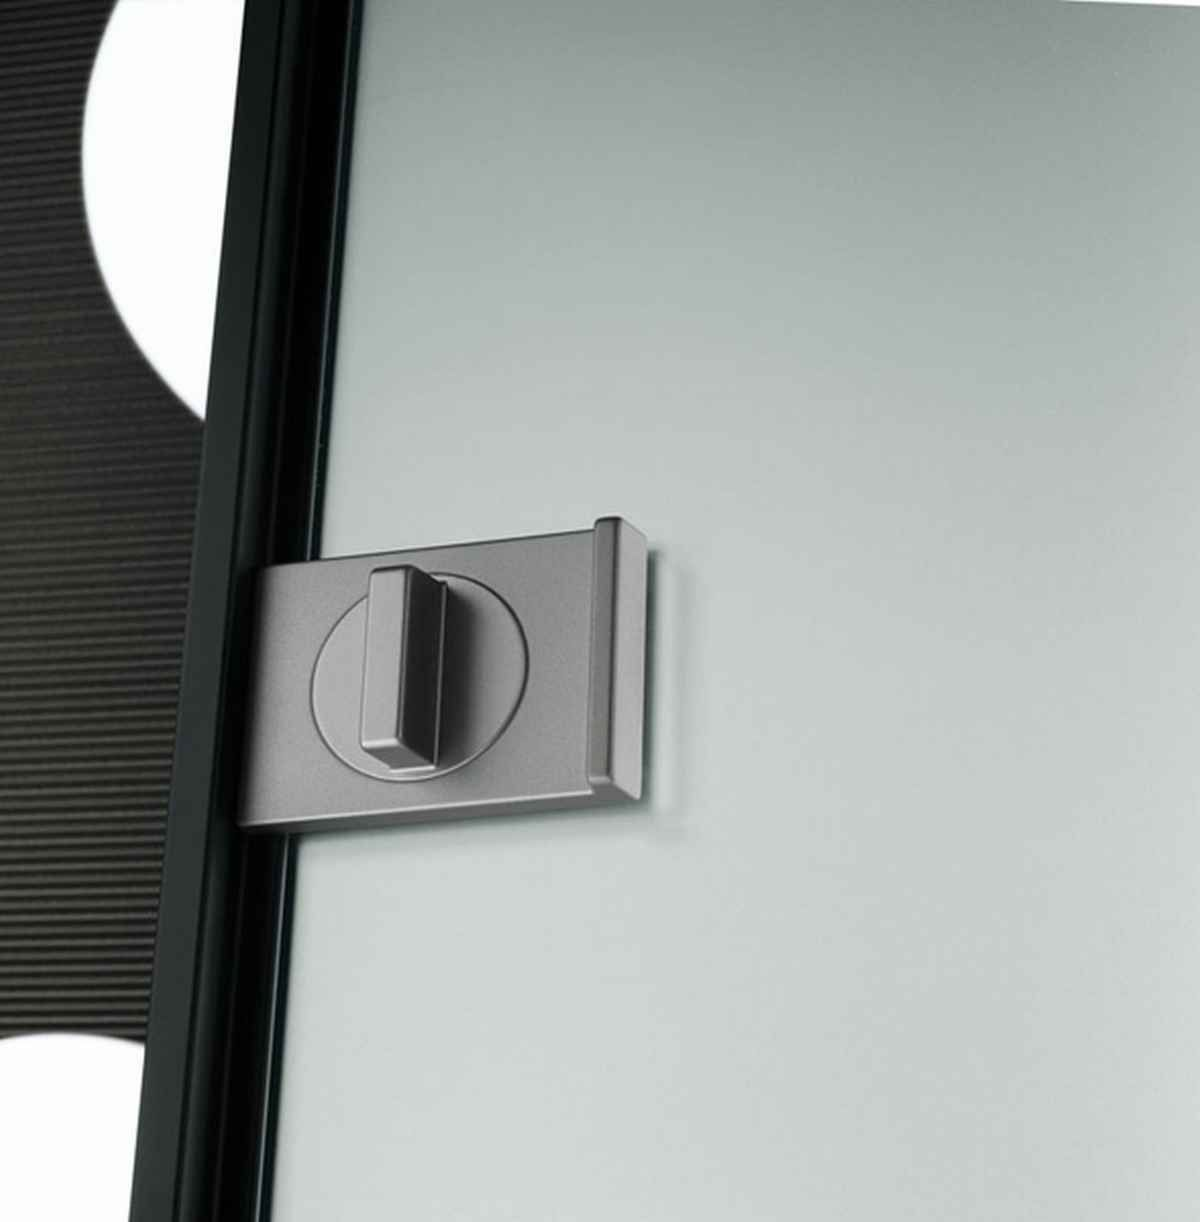 Wonderful Sliding Door Lock Interesting Design Decoracao Ideias